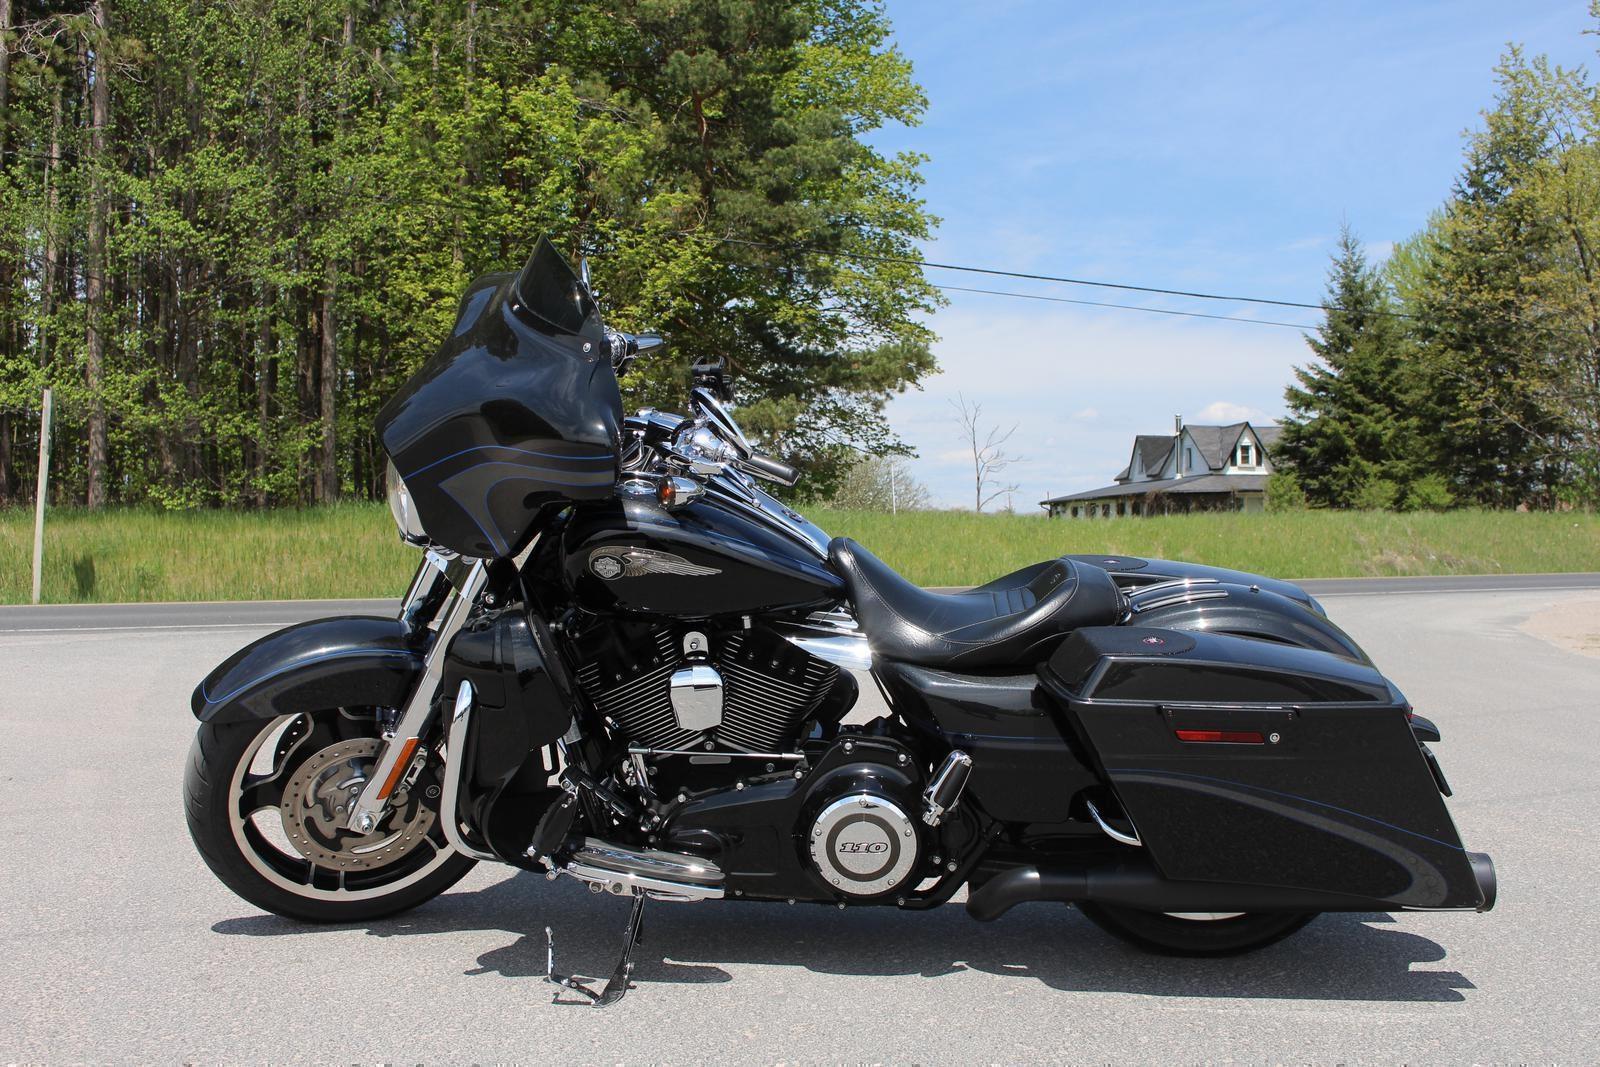 harley davidson road king 2013 used motorcycle for sale in lakefield ontario. Black Bedroom Furniture Sets. Home Design Ideas